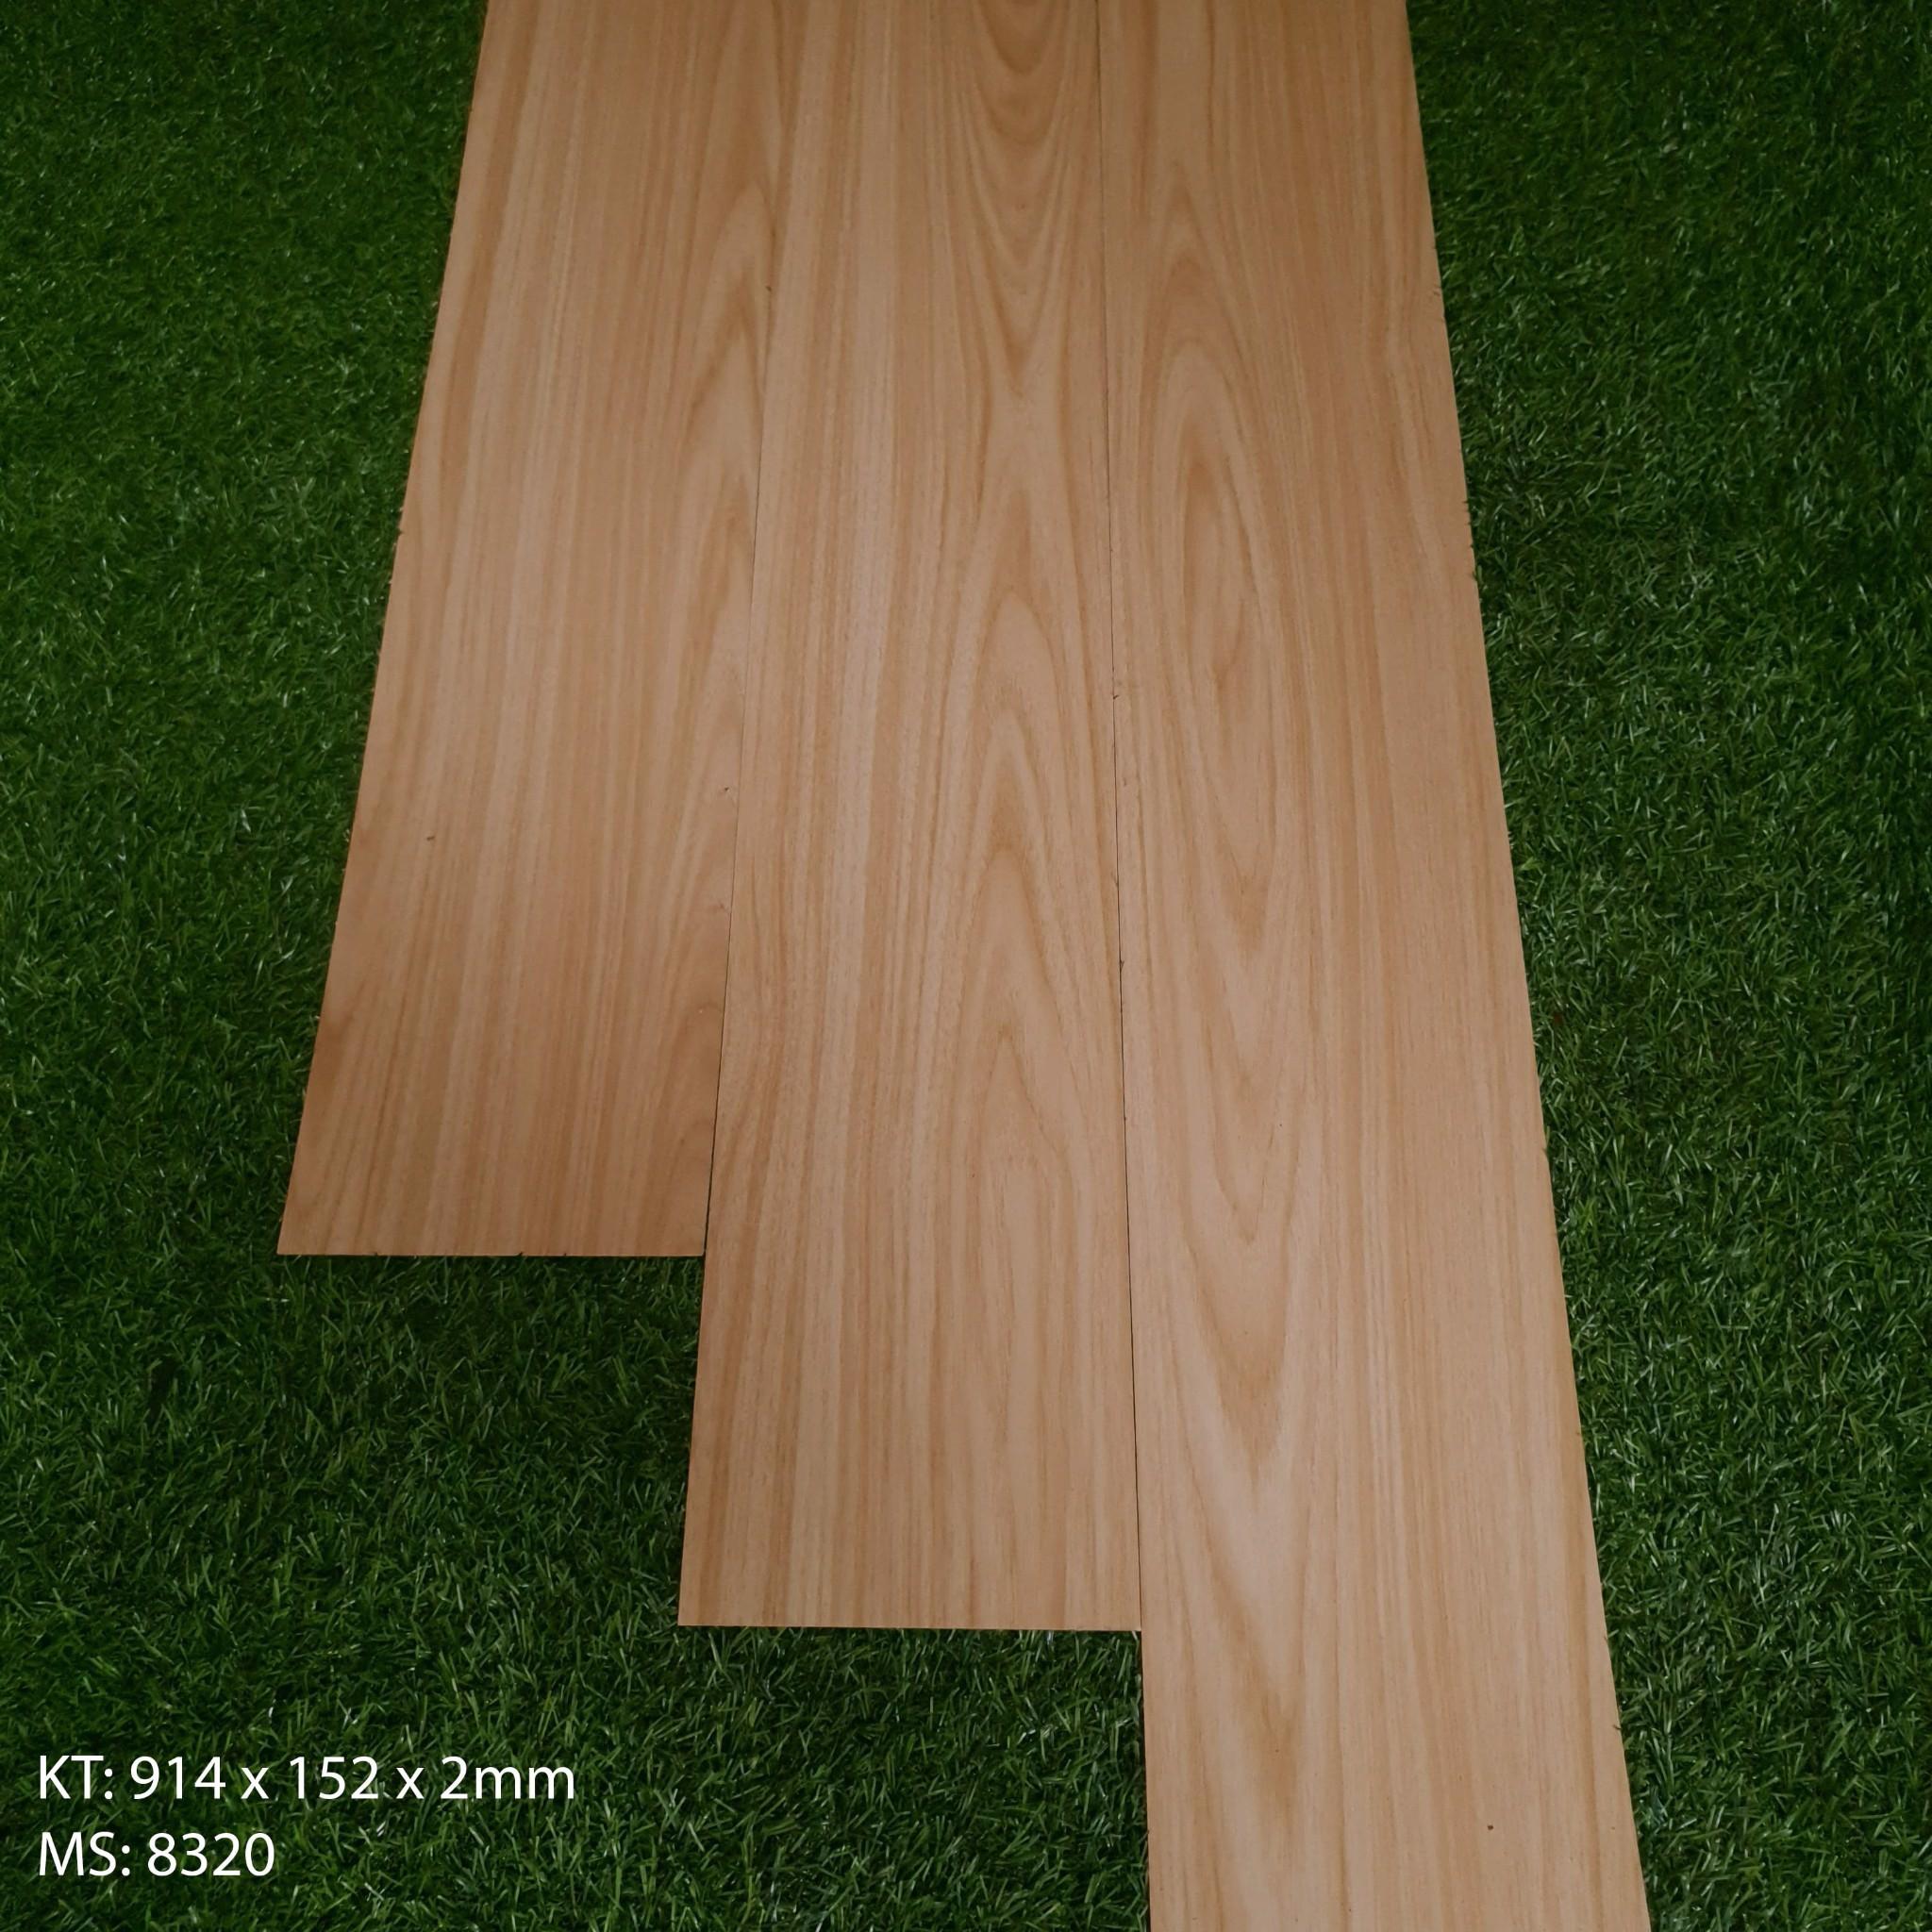 Sàn nhựa dán keo CLC-8320